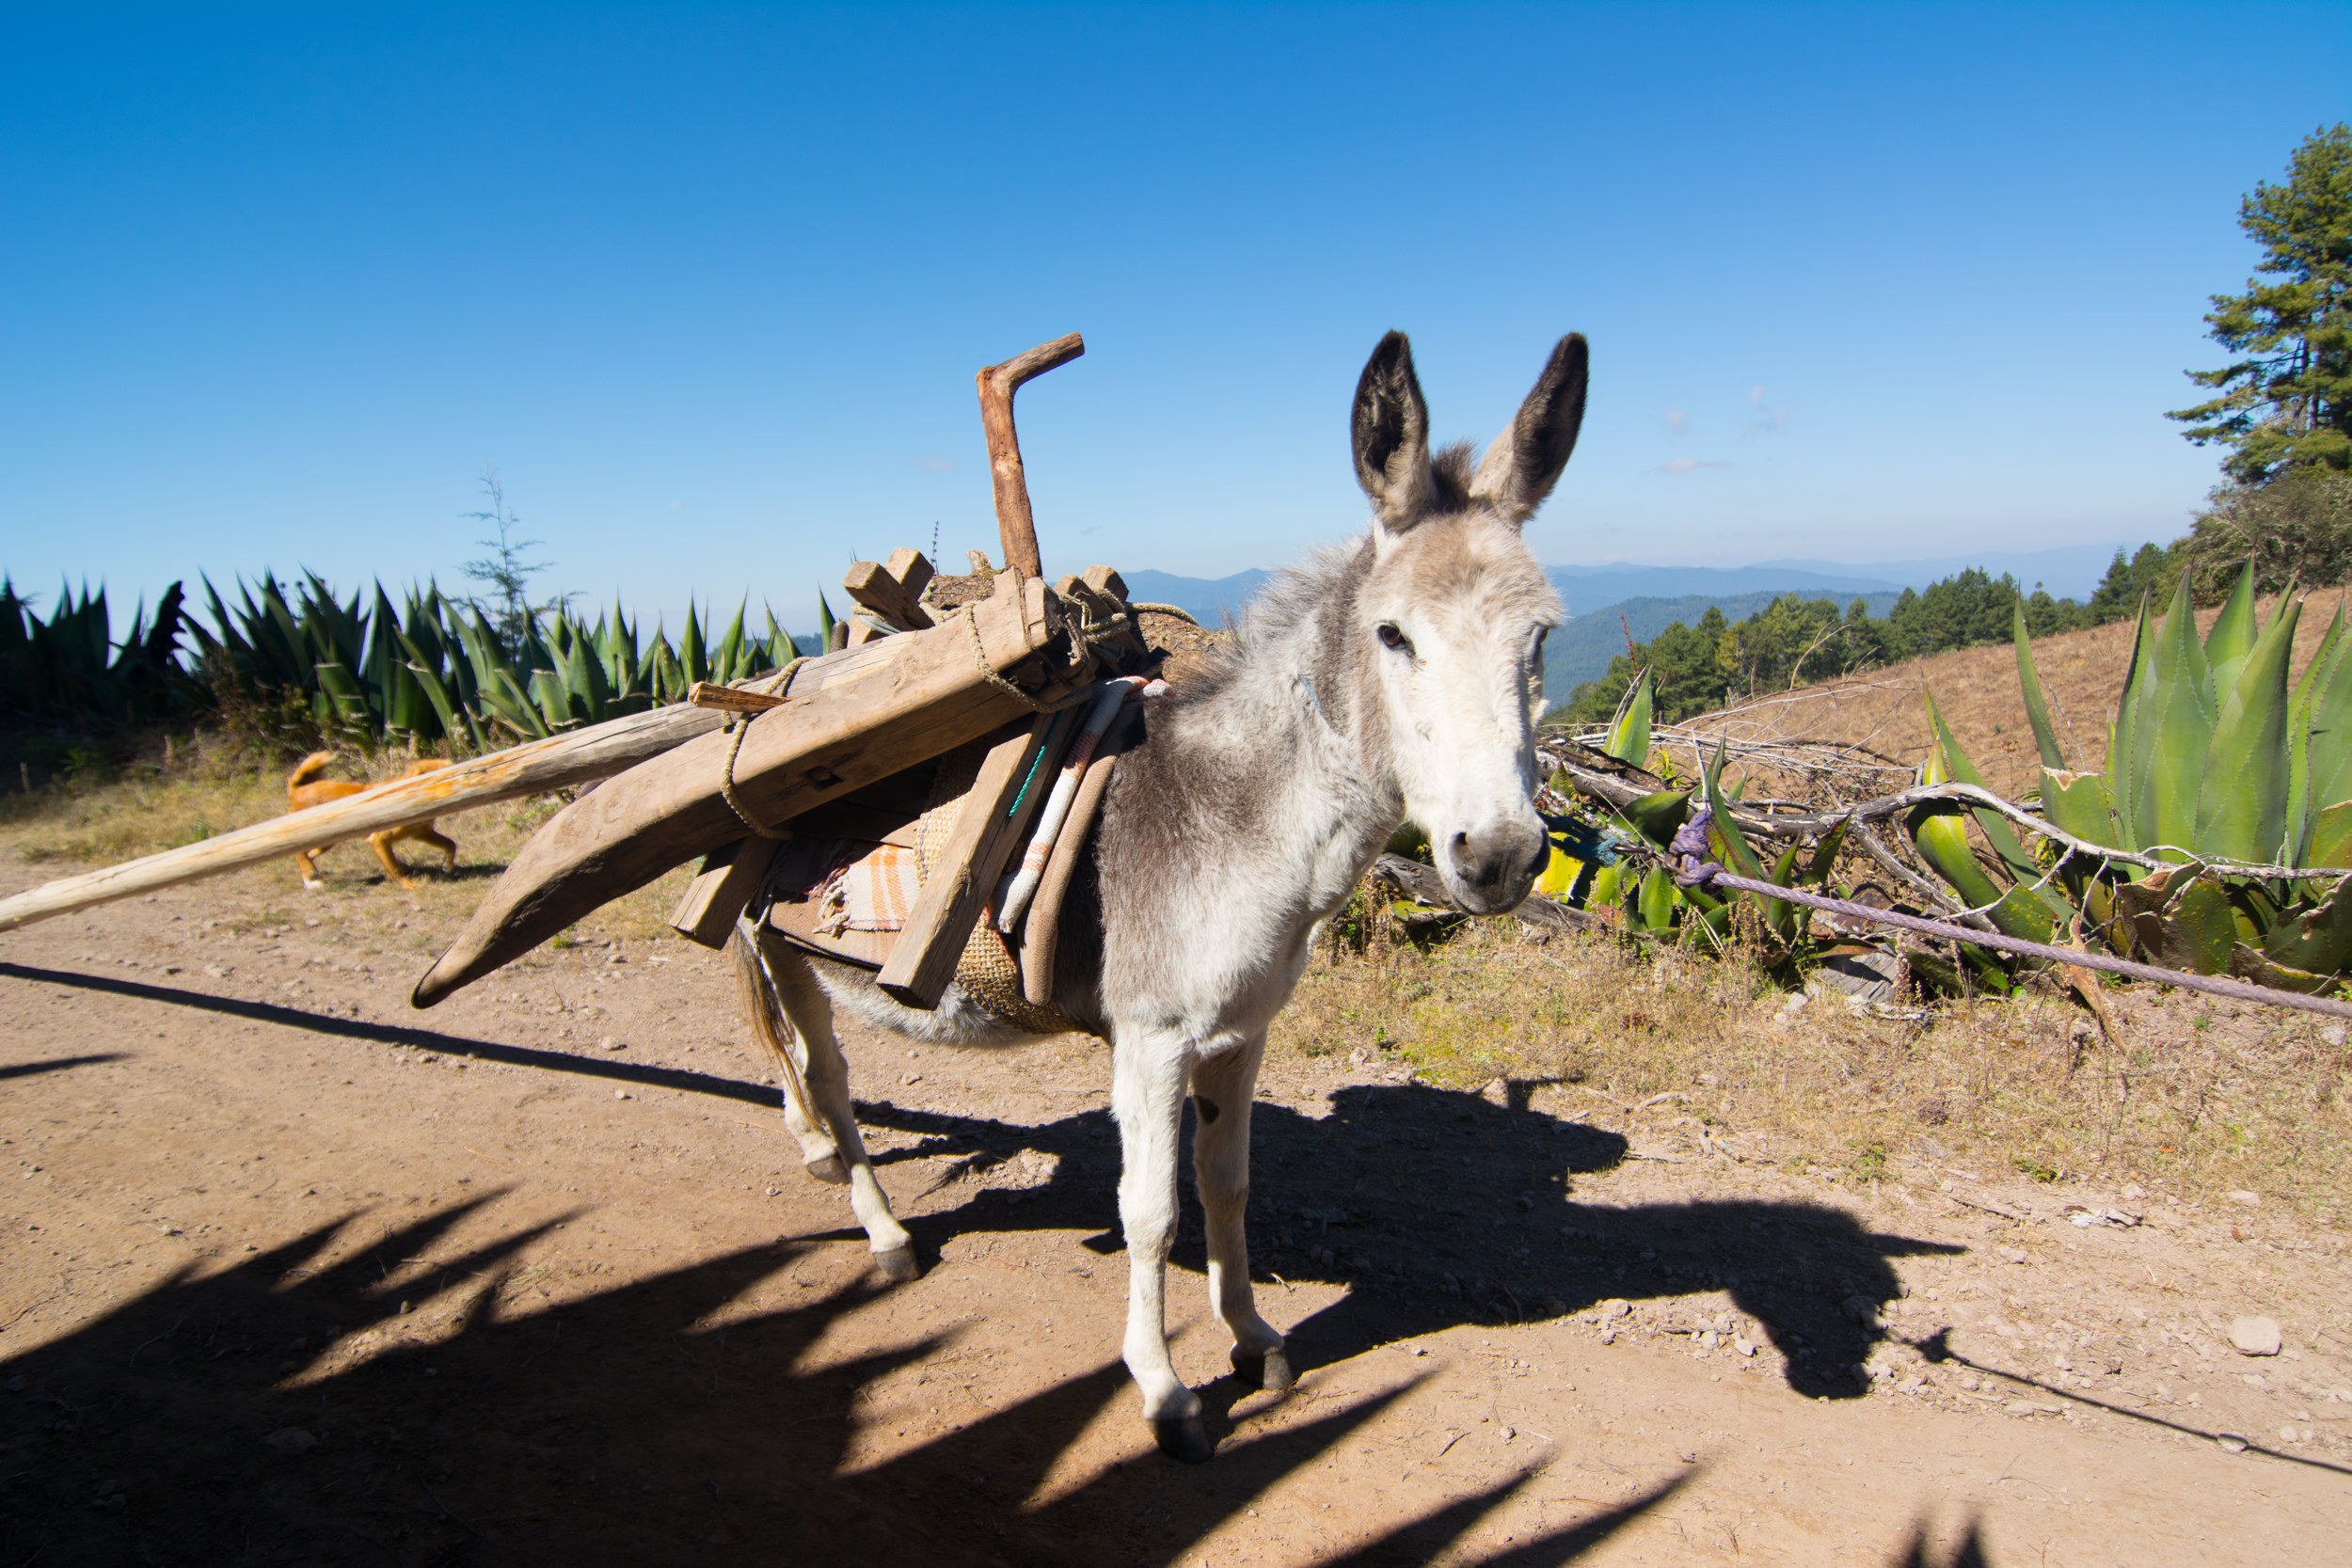 Trail Companions mountain biking in the Sierra Norte Mountains of Oaxaca